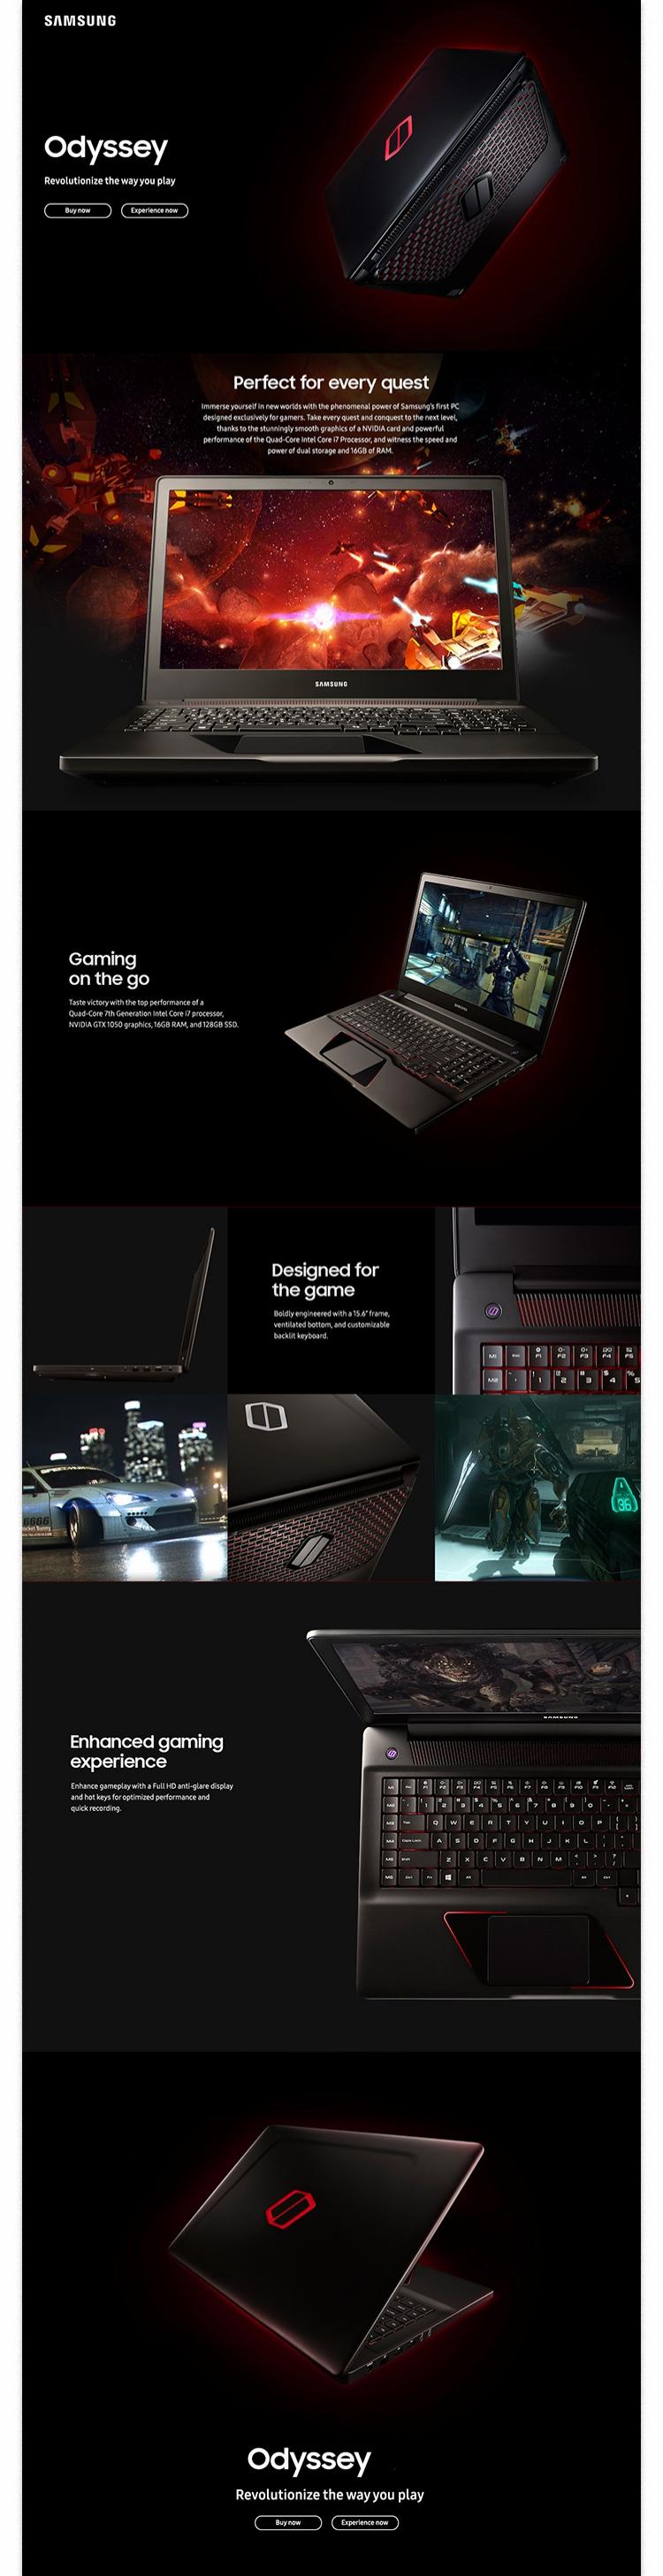 SPR202226-Odyssey_LearnMore.jpg